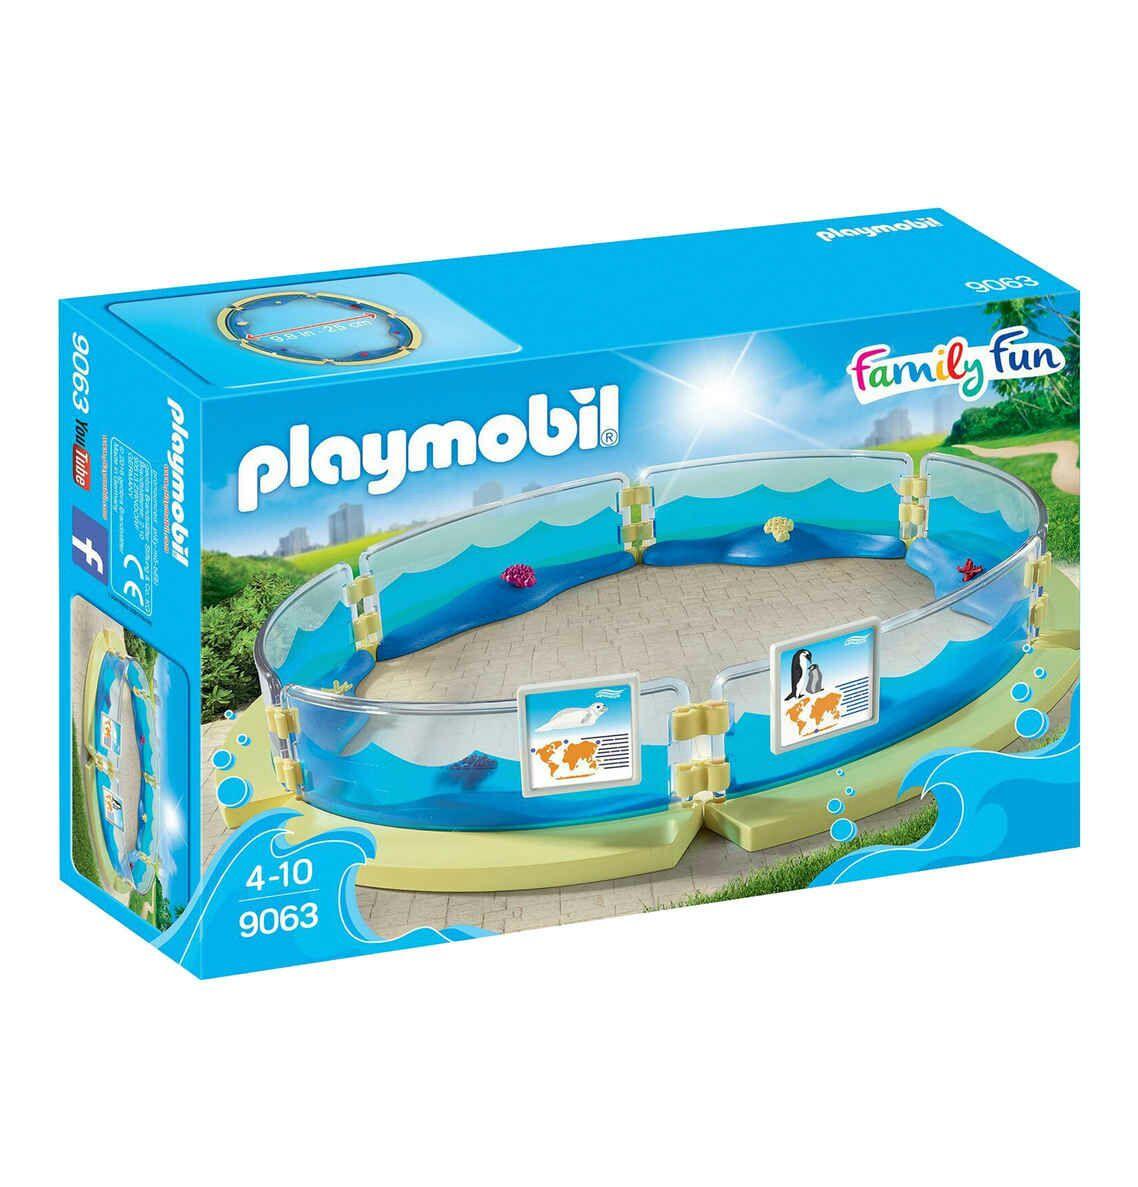 [Galeria Kaufhof] Playmobil family fun Meerestierbecken 9063 (Filialabholung, Versand +3,95)